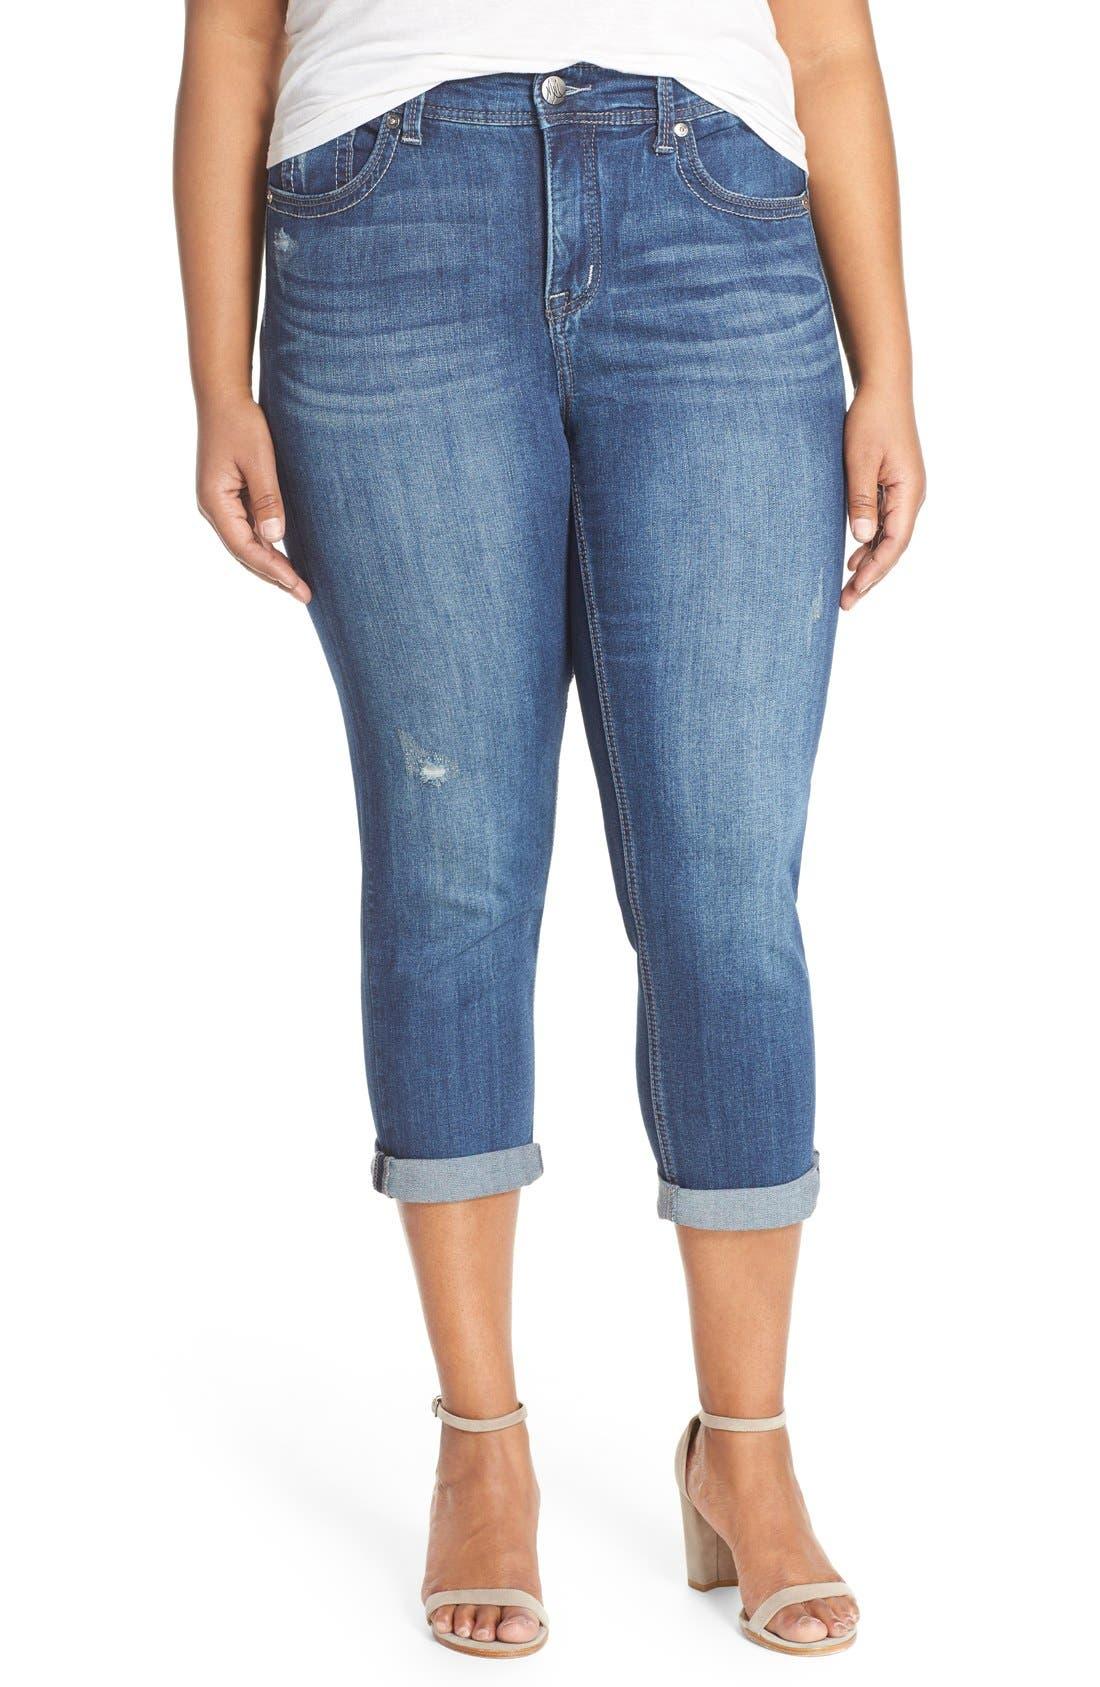 MELISSA MCCARTHY SEVEN7 Stretch Crop Jeans